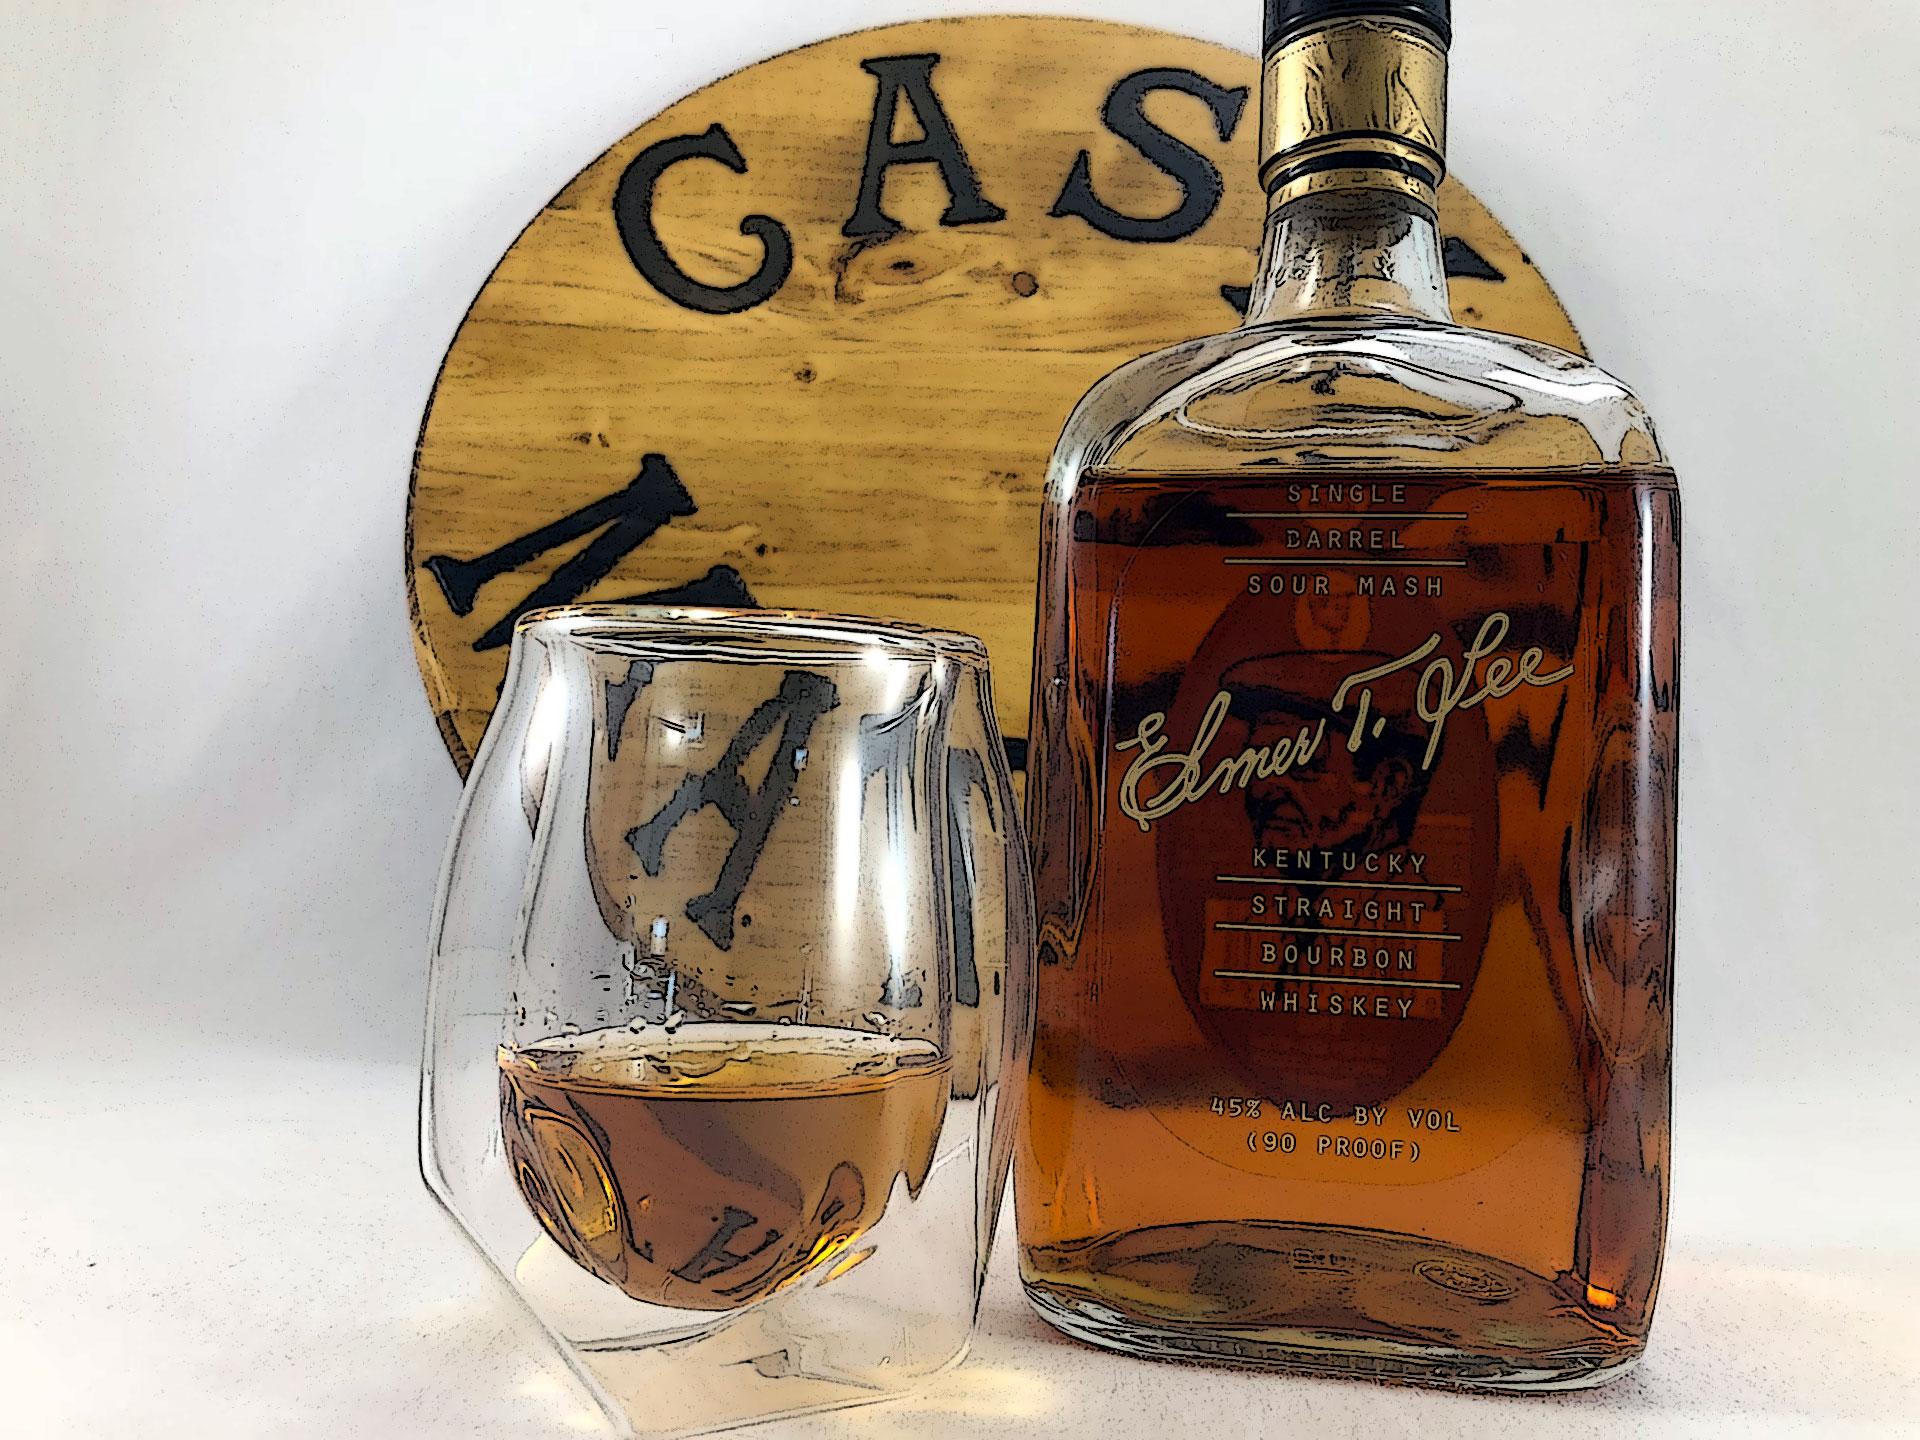 Elmer T Lee Single Barrel Sour Mash Bourbon